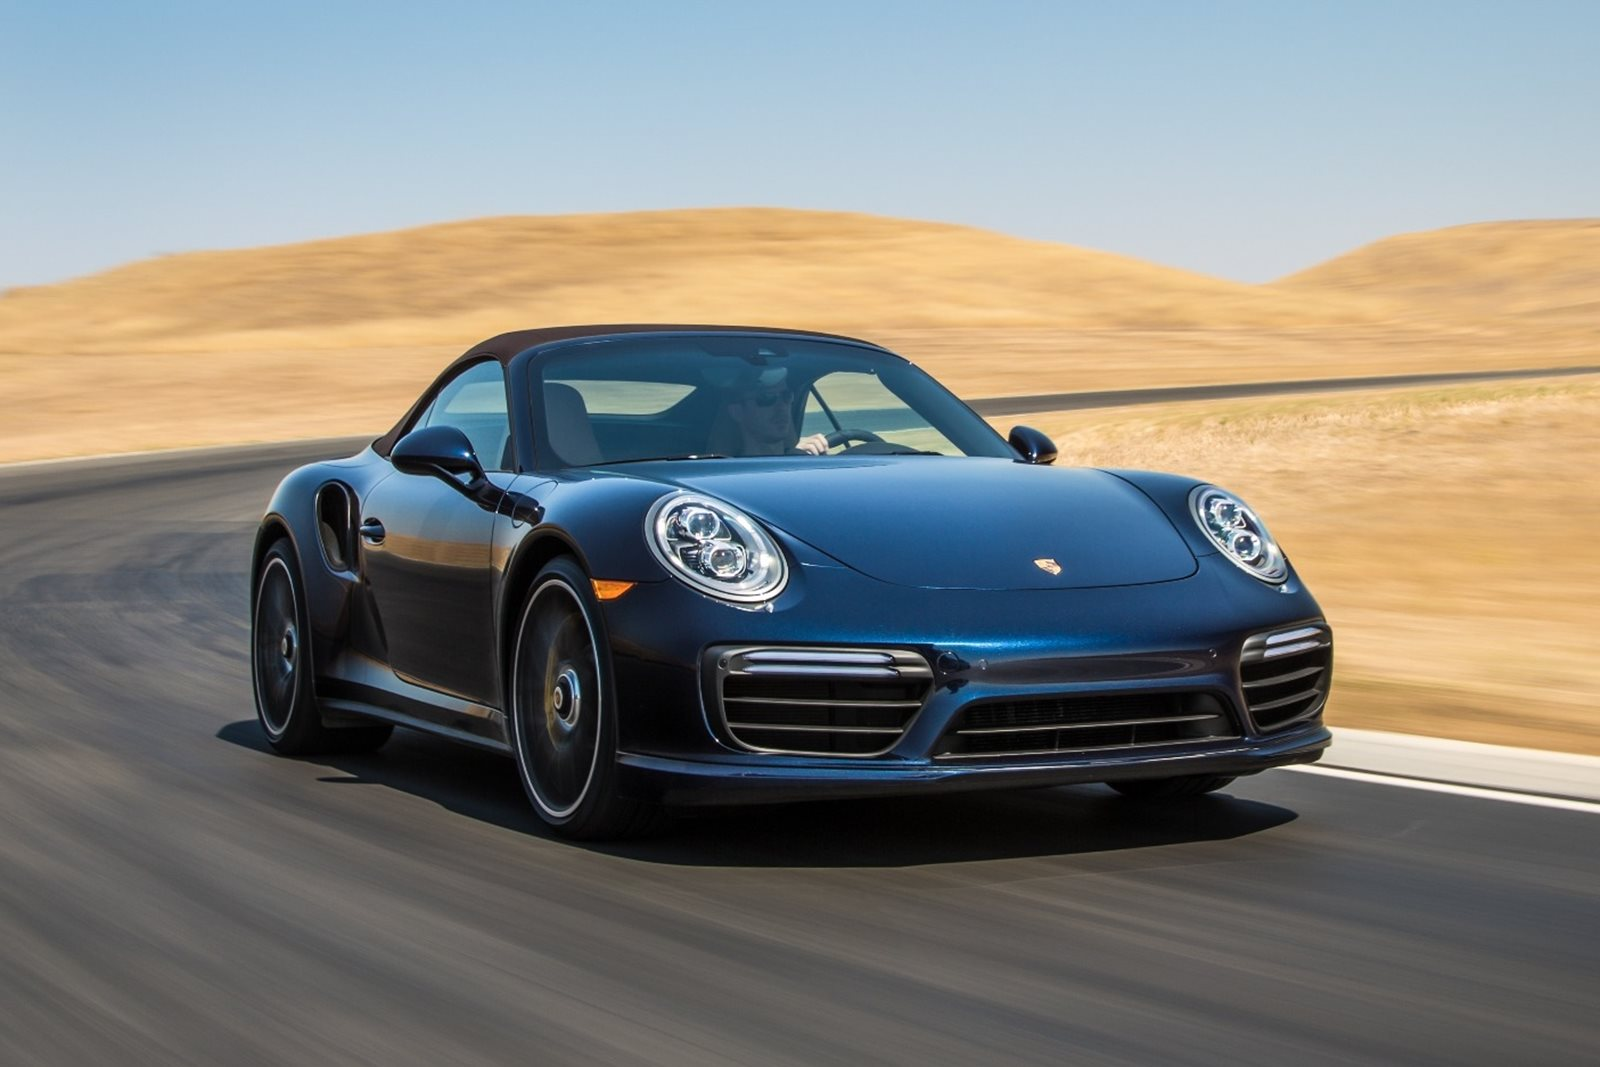 2018 Porsche 911 Turbo Cabriolet Review Trims Specs And